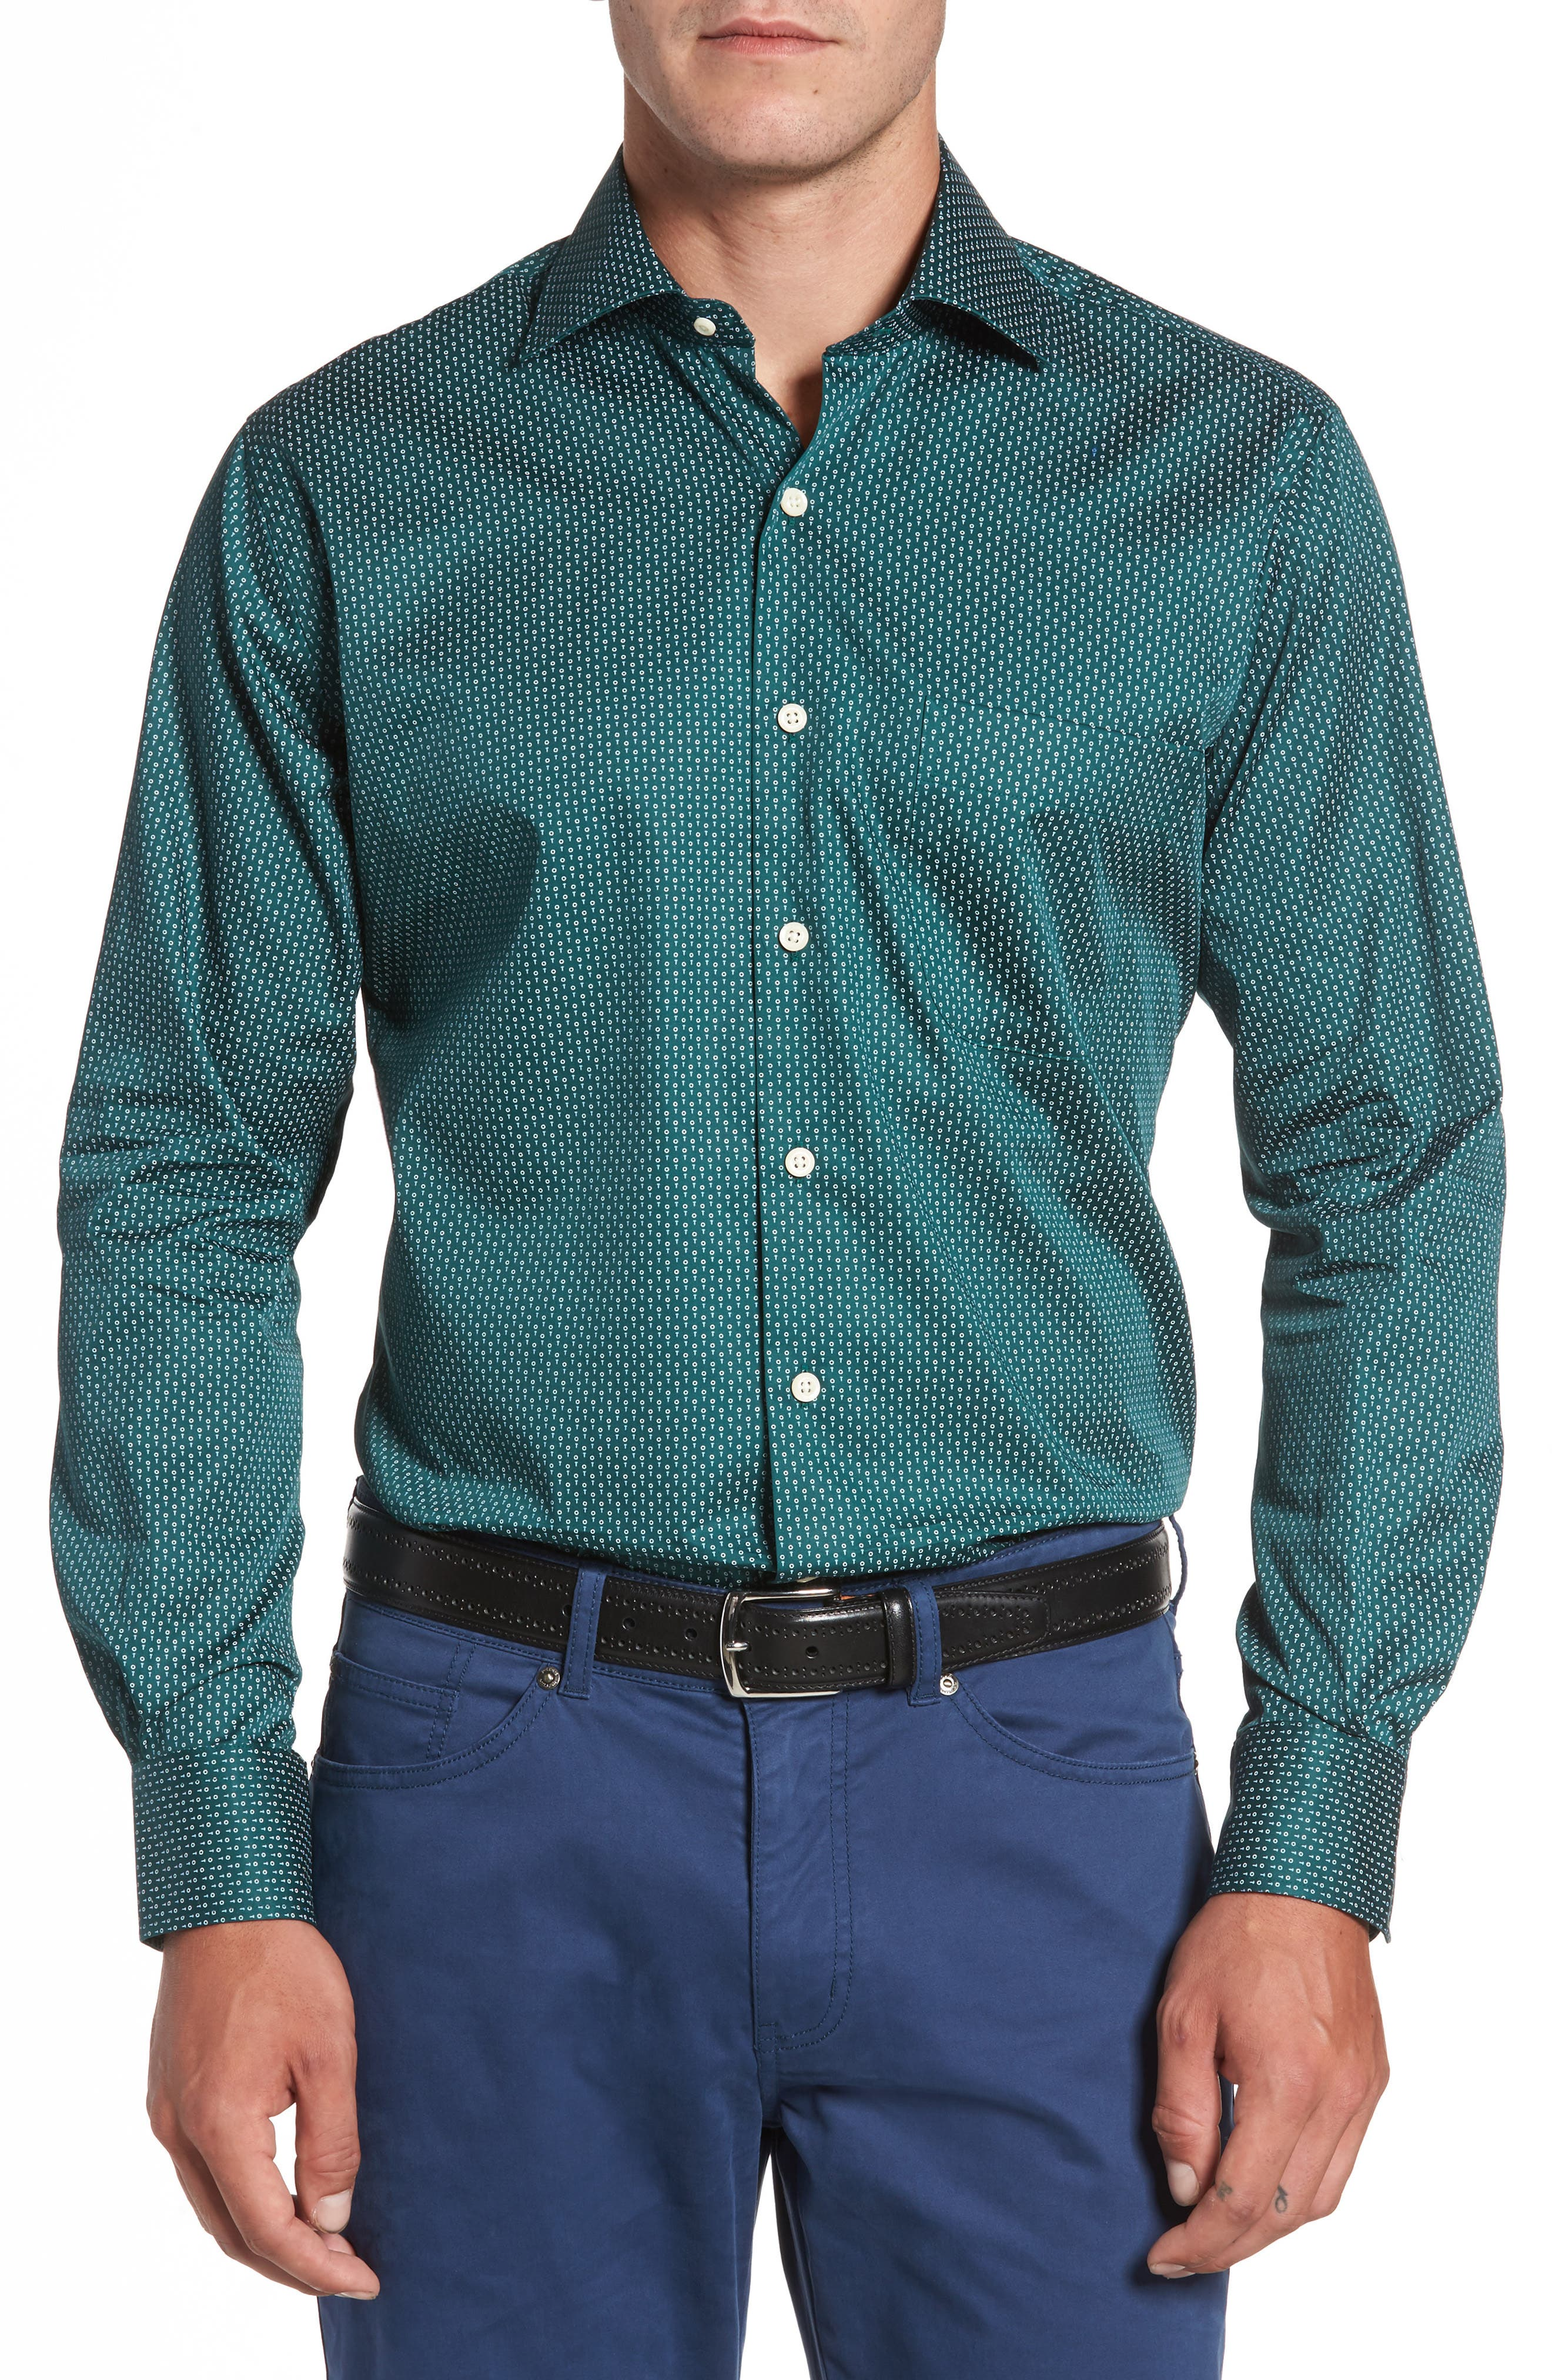 Alternate Image 1 Selected - Peter Millar Golf Tee Print Sport Shirt